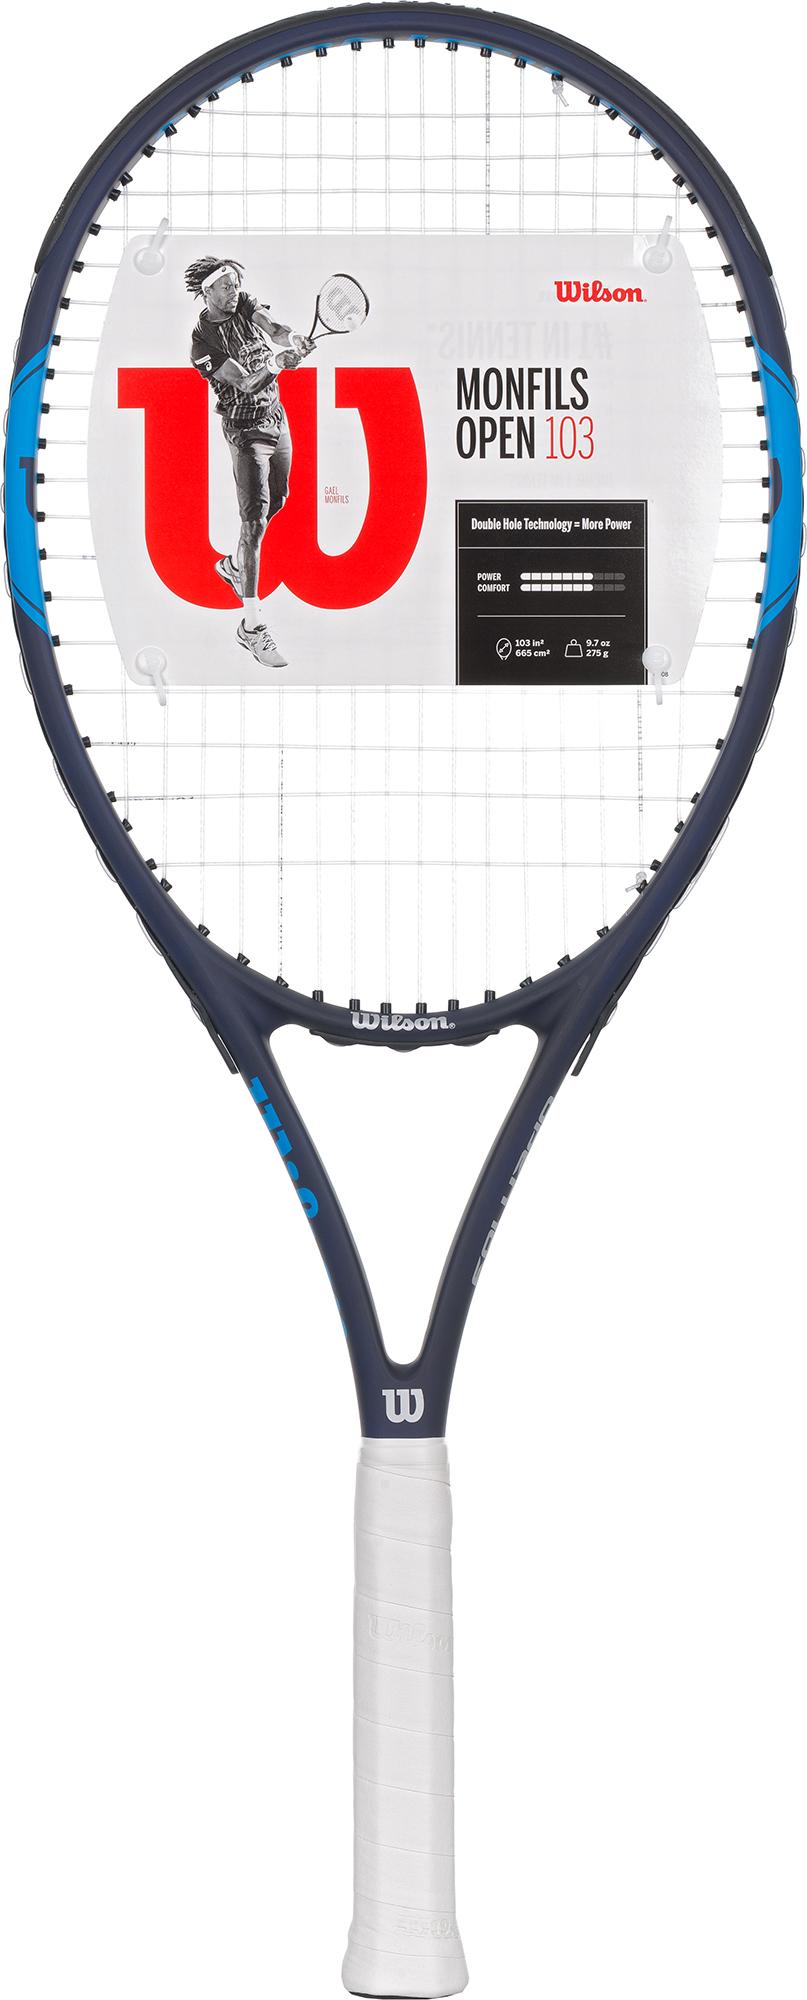 Wilson Ракетка для большого тенниса Wilson Monfils Open 103, размер 3 wilson набор мячей для большого тенниса wilson us open x3 размер без размера